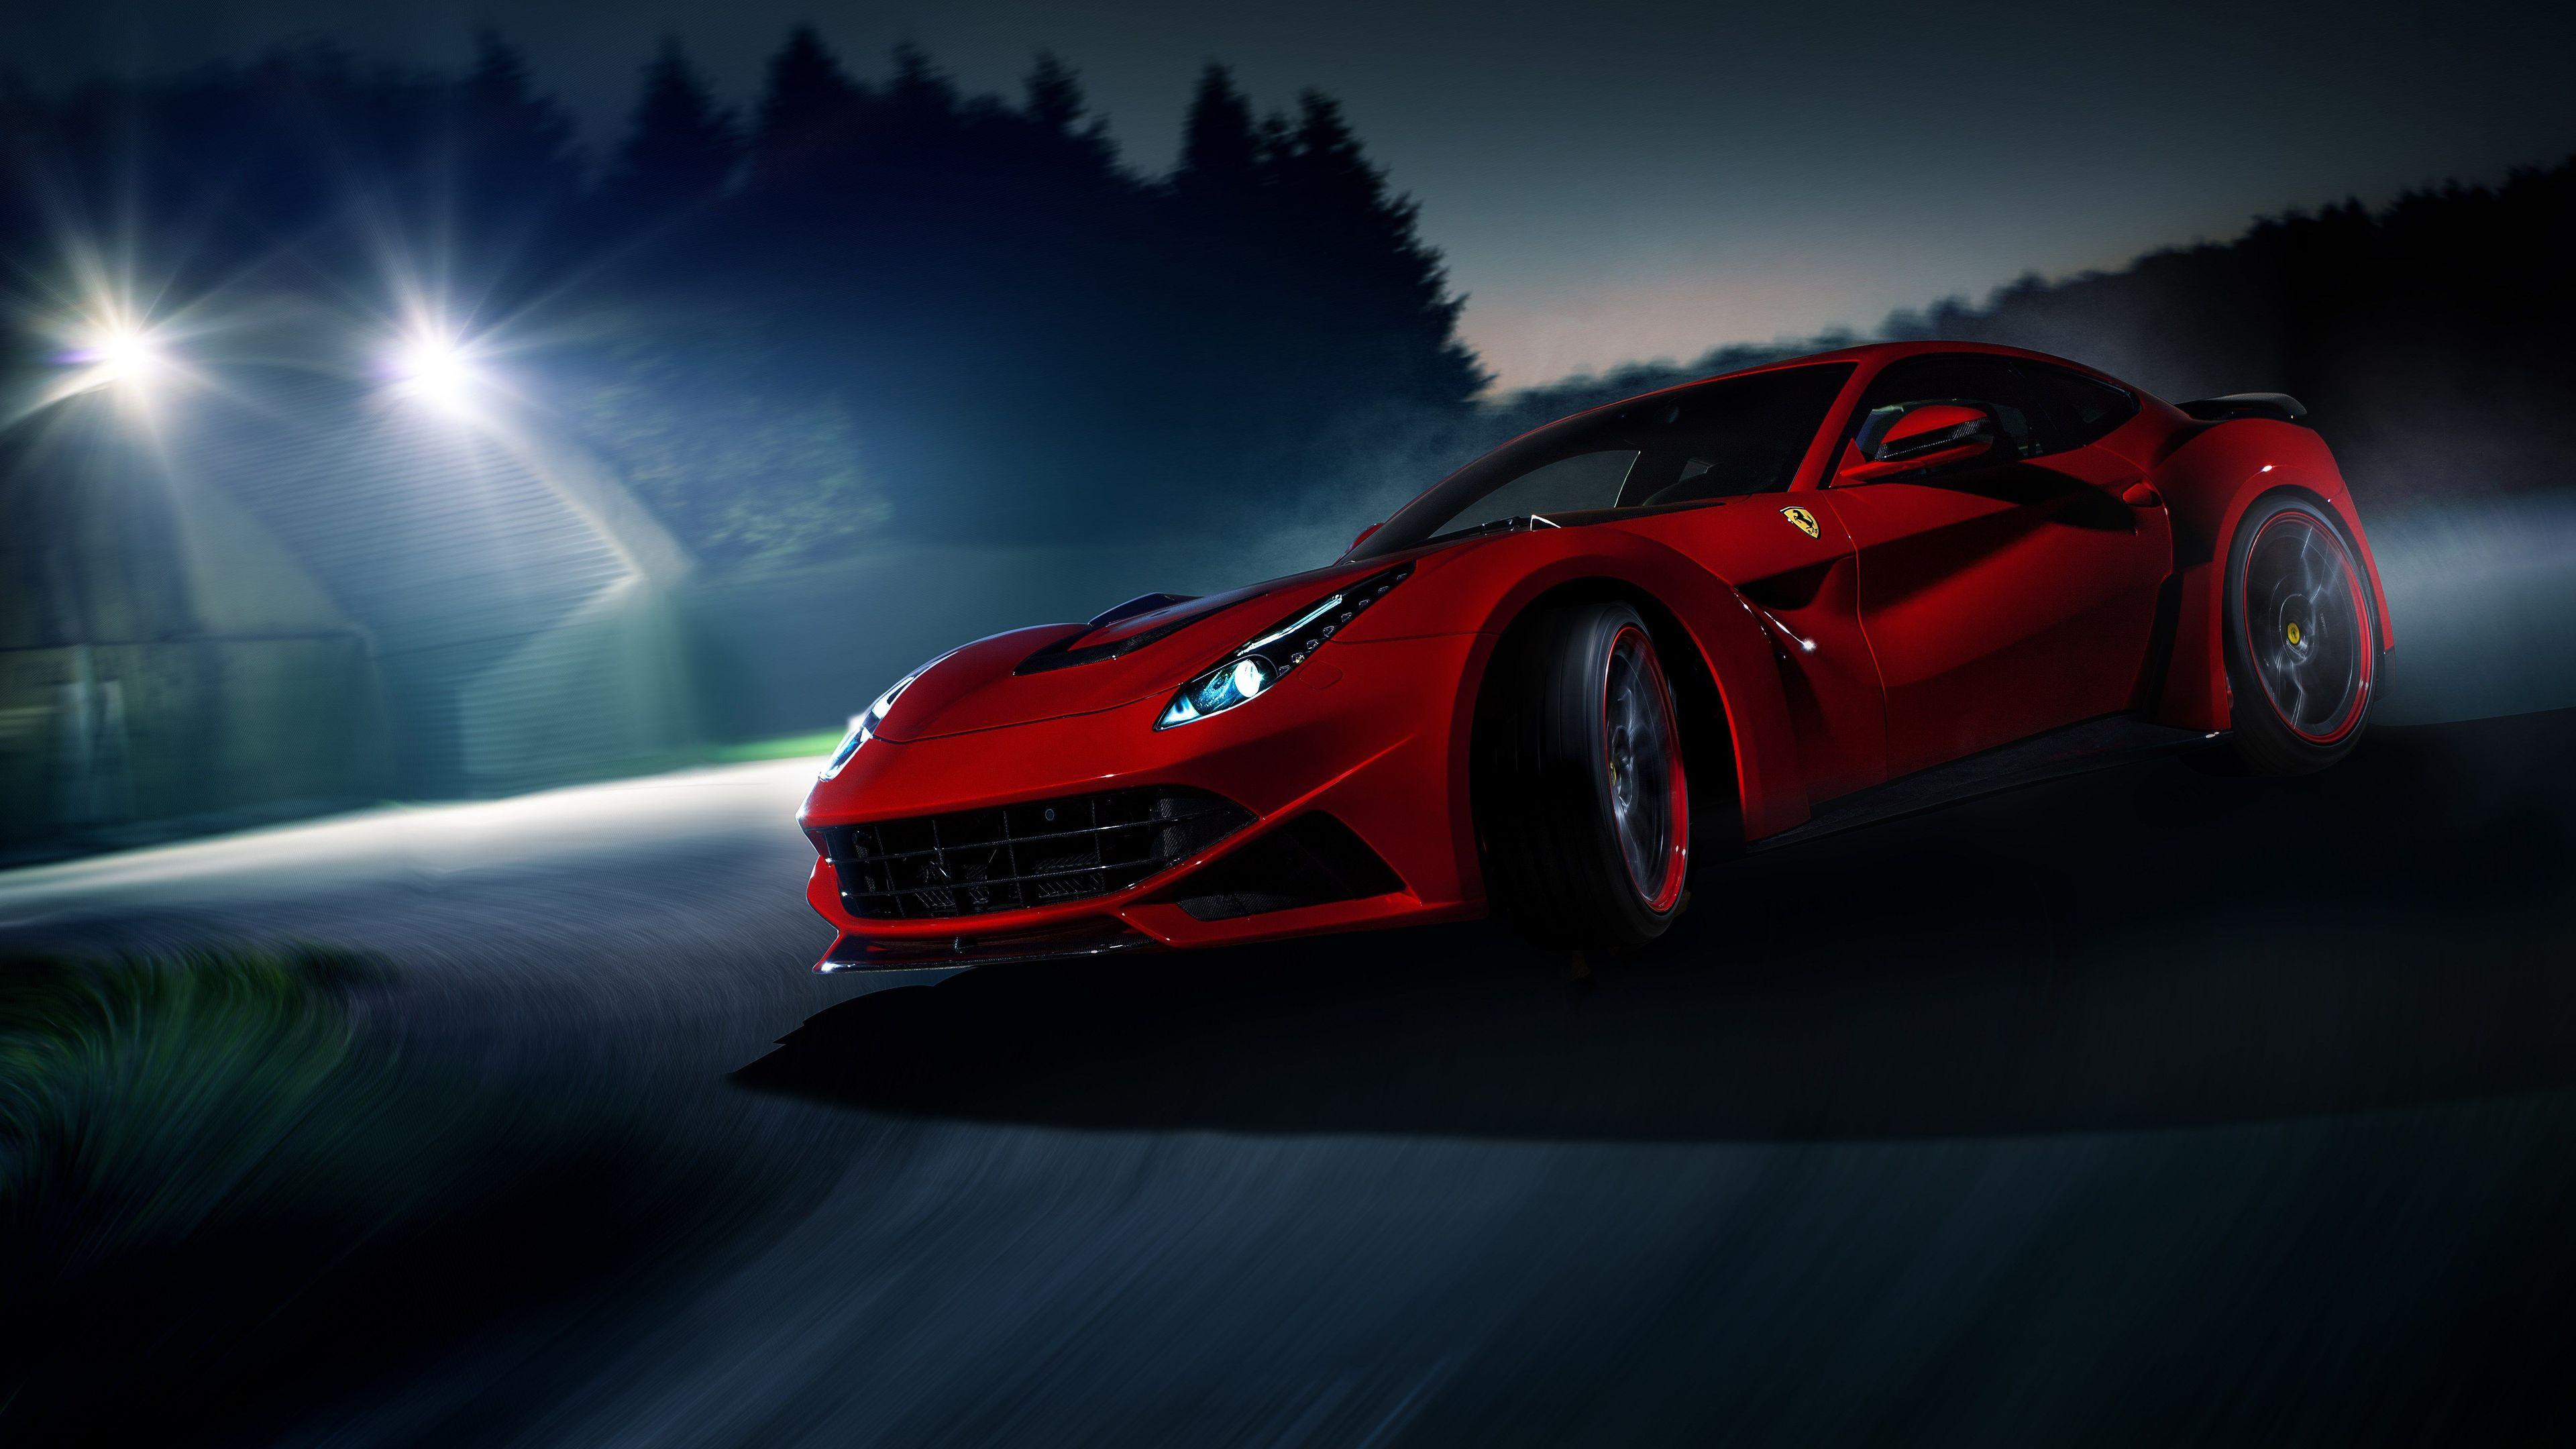 ferrari f12 n largo novitec 1539112143 - Ferrari F12 N Largo Novitec - hd-wallpapers, ferrari wallpapers, ferrari f12 tdf wallpapers, cars wallpapers, 4k-wallpapers, 2018 cars wallpapers